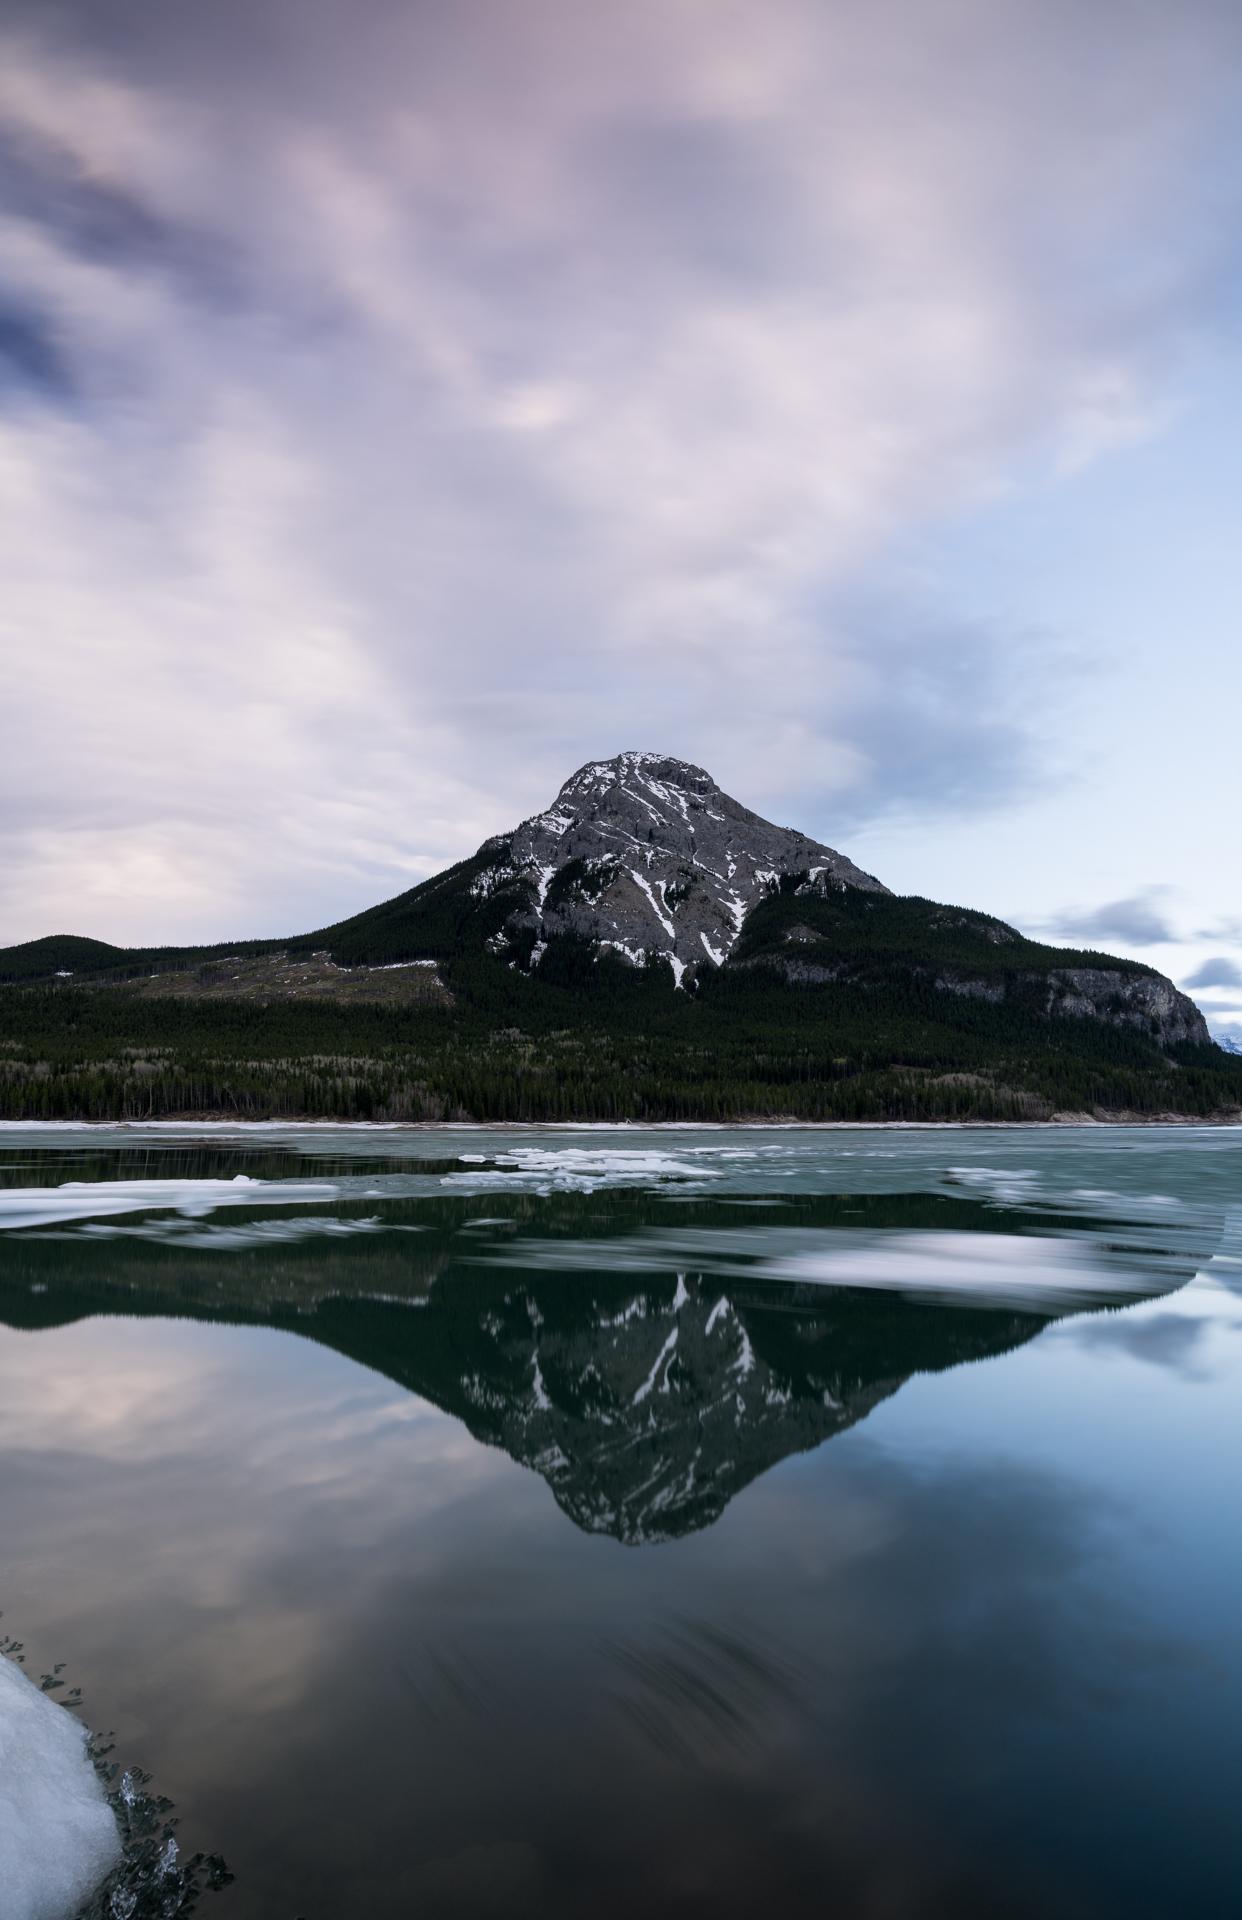 Barrier Lake Sunrise  Sony A7ii, 16-35mm Zeiss F4  25 Seconds,  f /11.0, 19mm, ISO 100